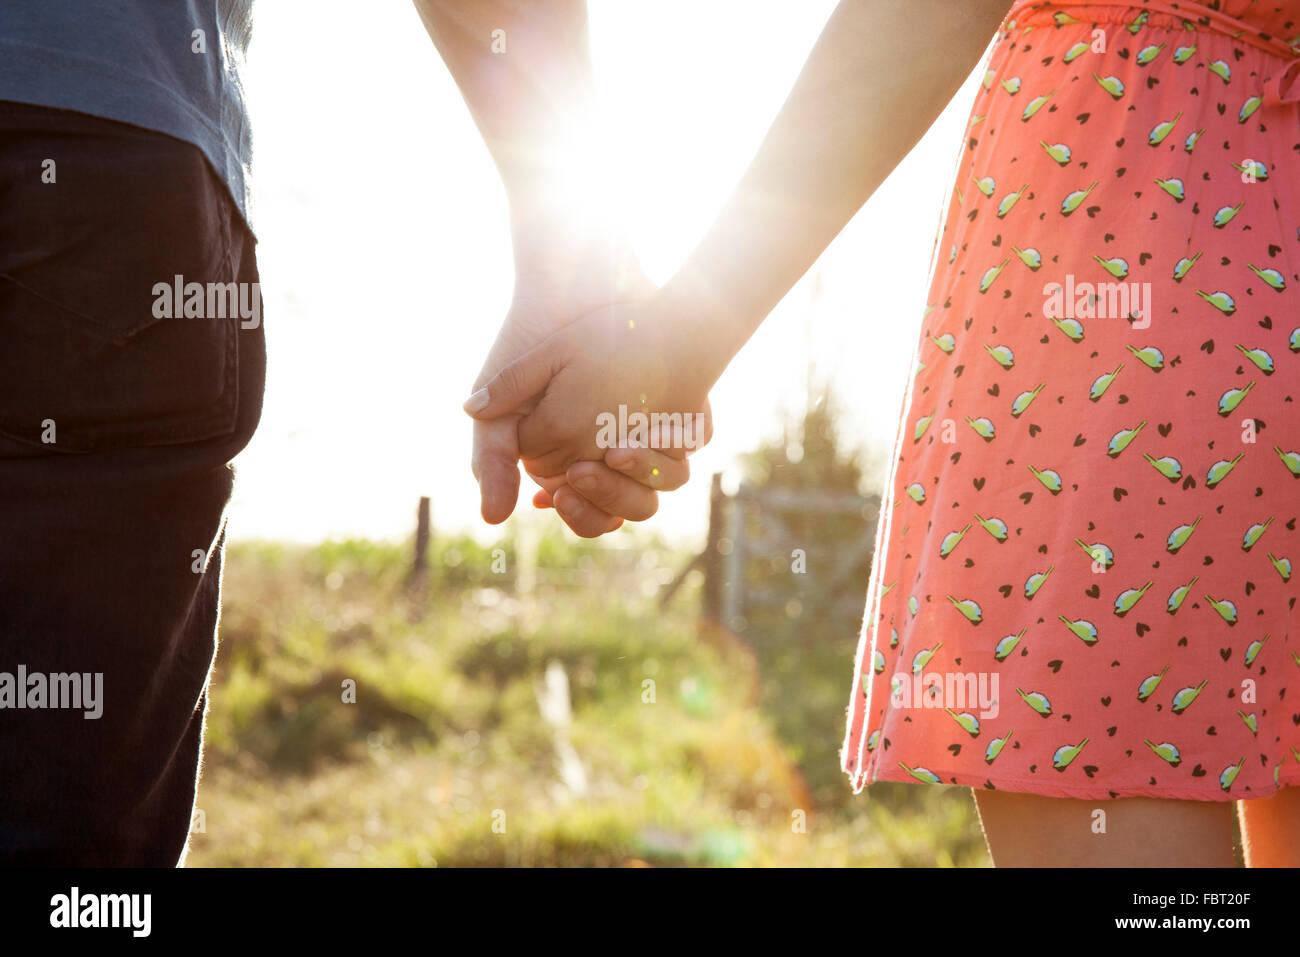 Paar Hand in Hand, close-up Stockbild